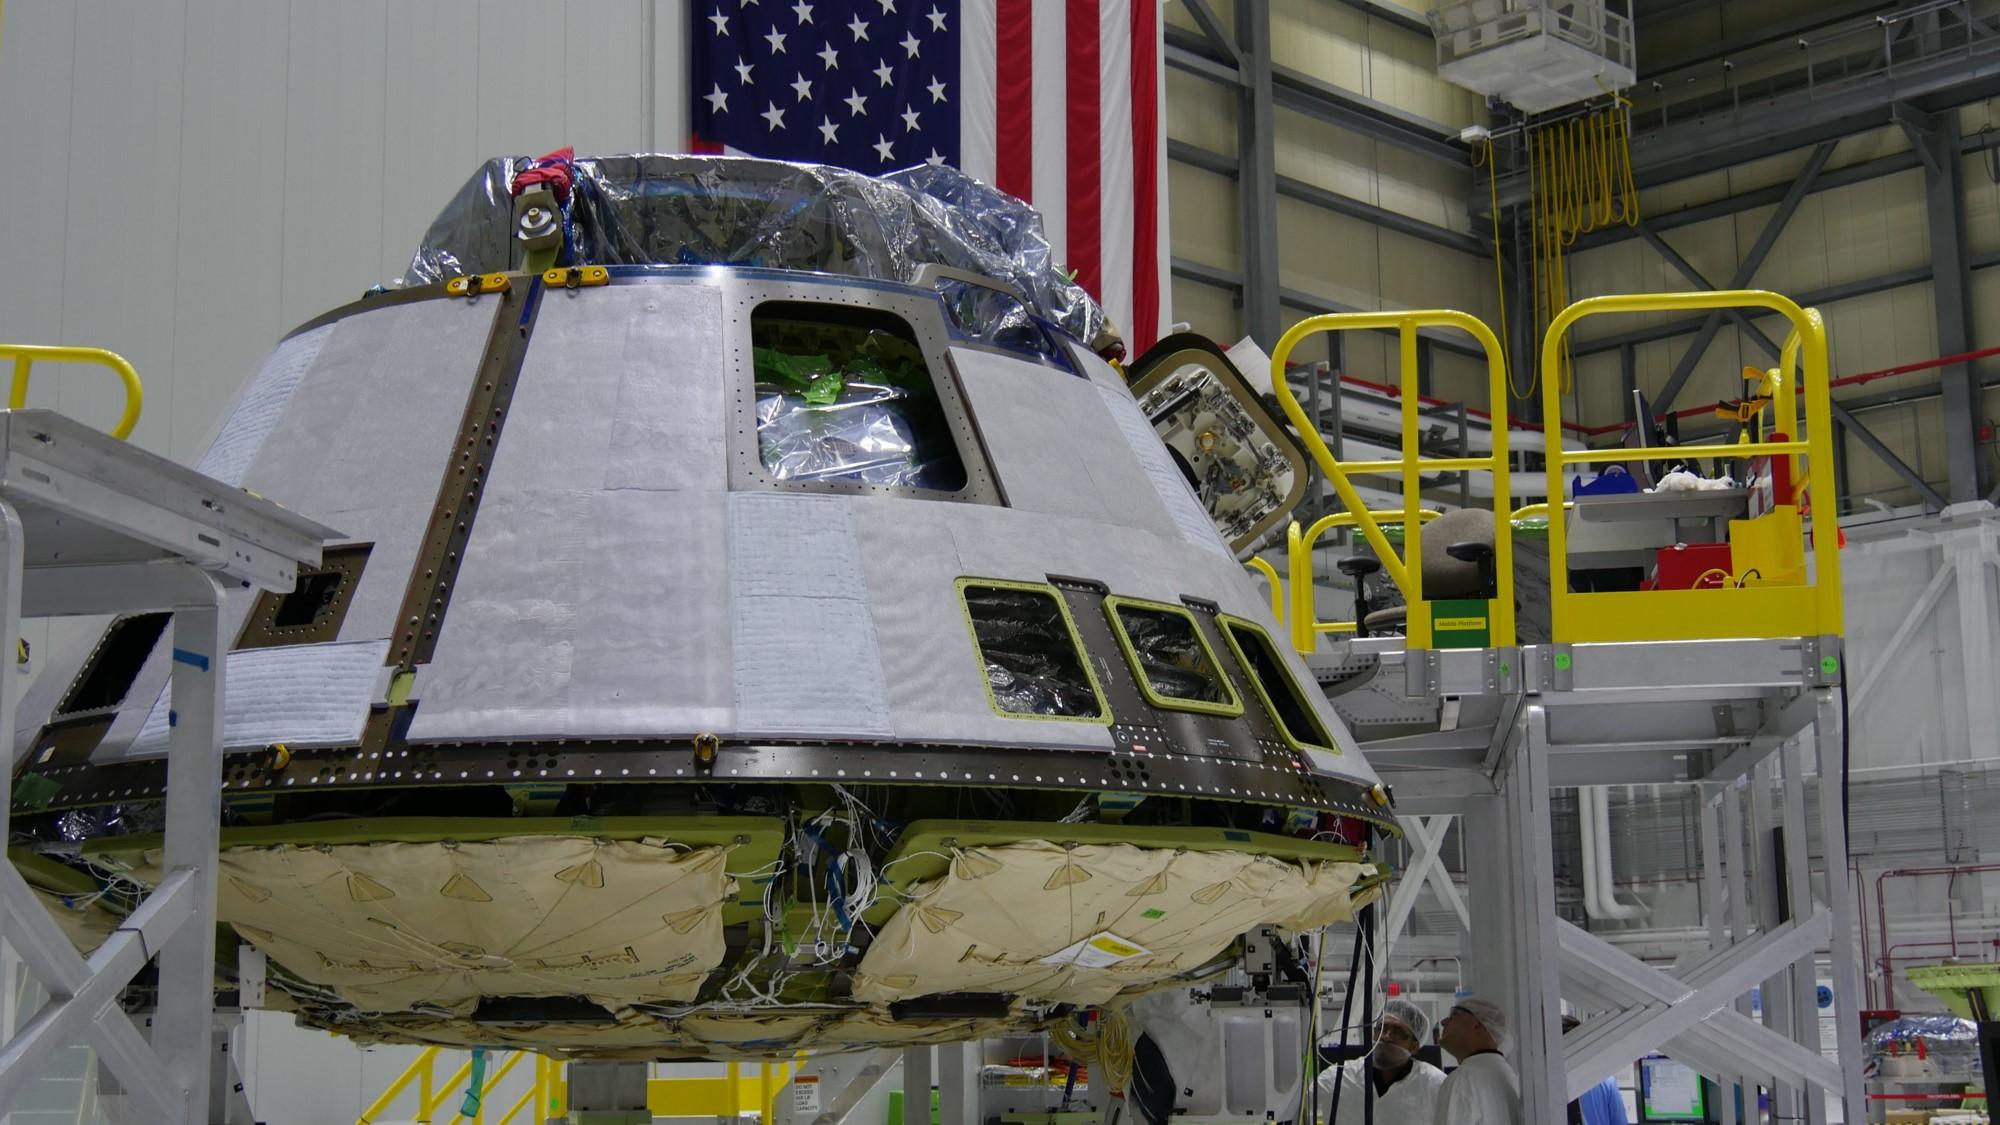 A Boeing CST-100 Starliner spacecraft under construction at Kennedy Space Center.